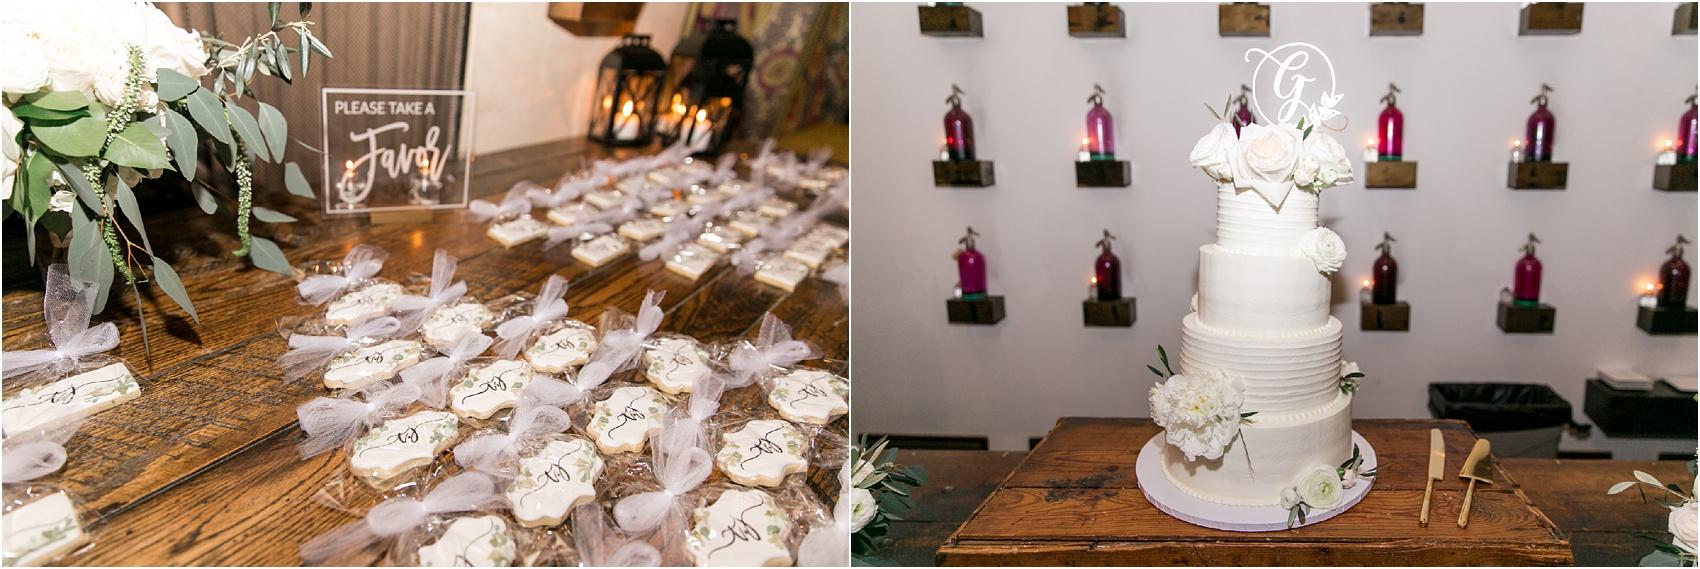 Savannah Eve Photography- Turnbill-Gilgan Wedding- Blog-85.jpg